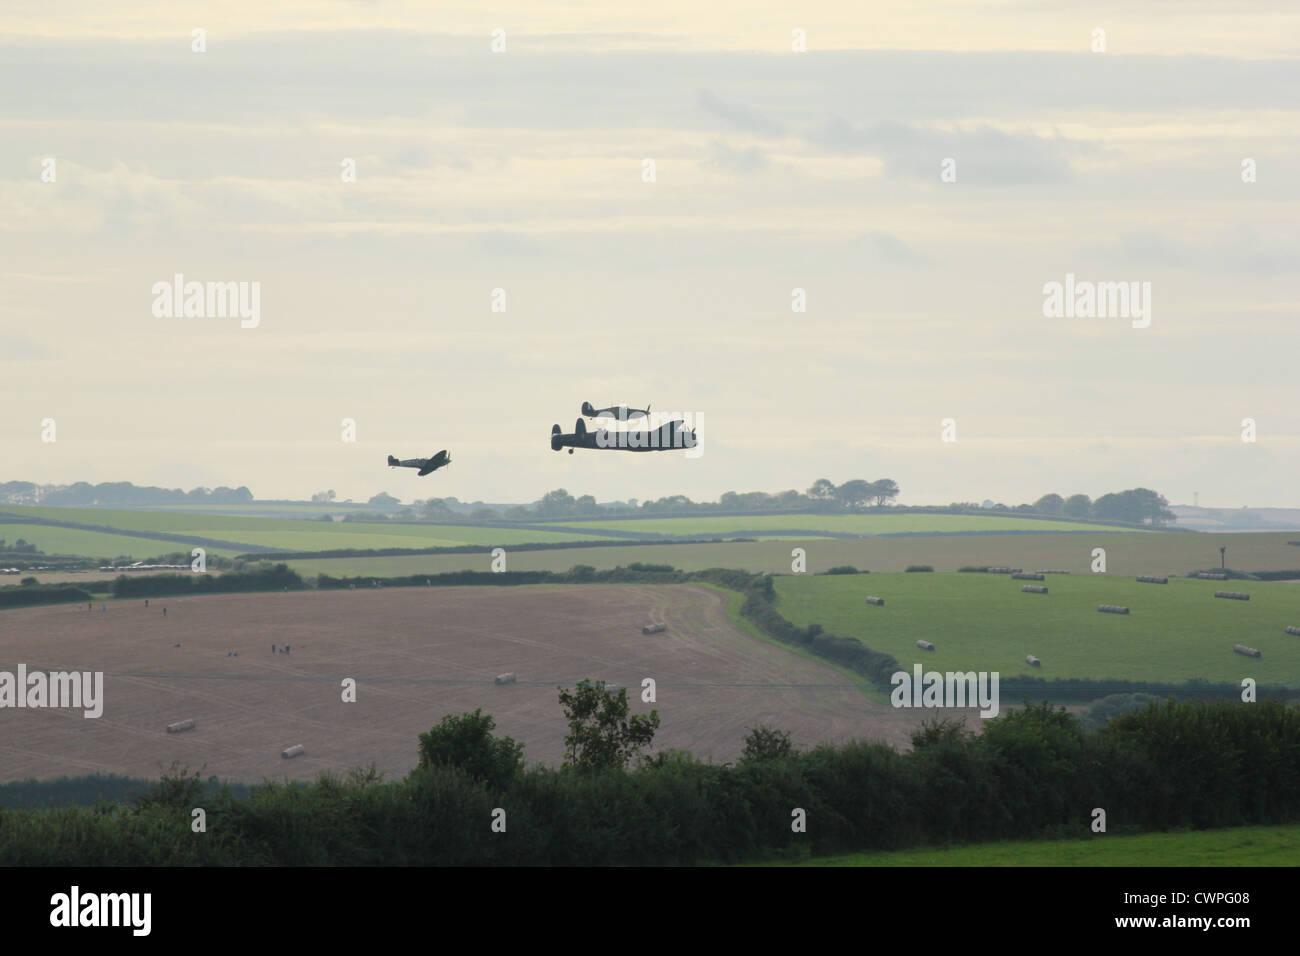 Battle of Britain Memorial Flight in formation over Dartmouth, Devon - Stock Image